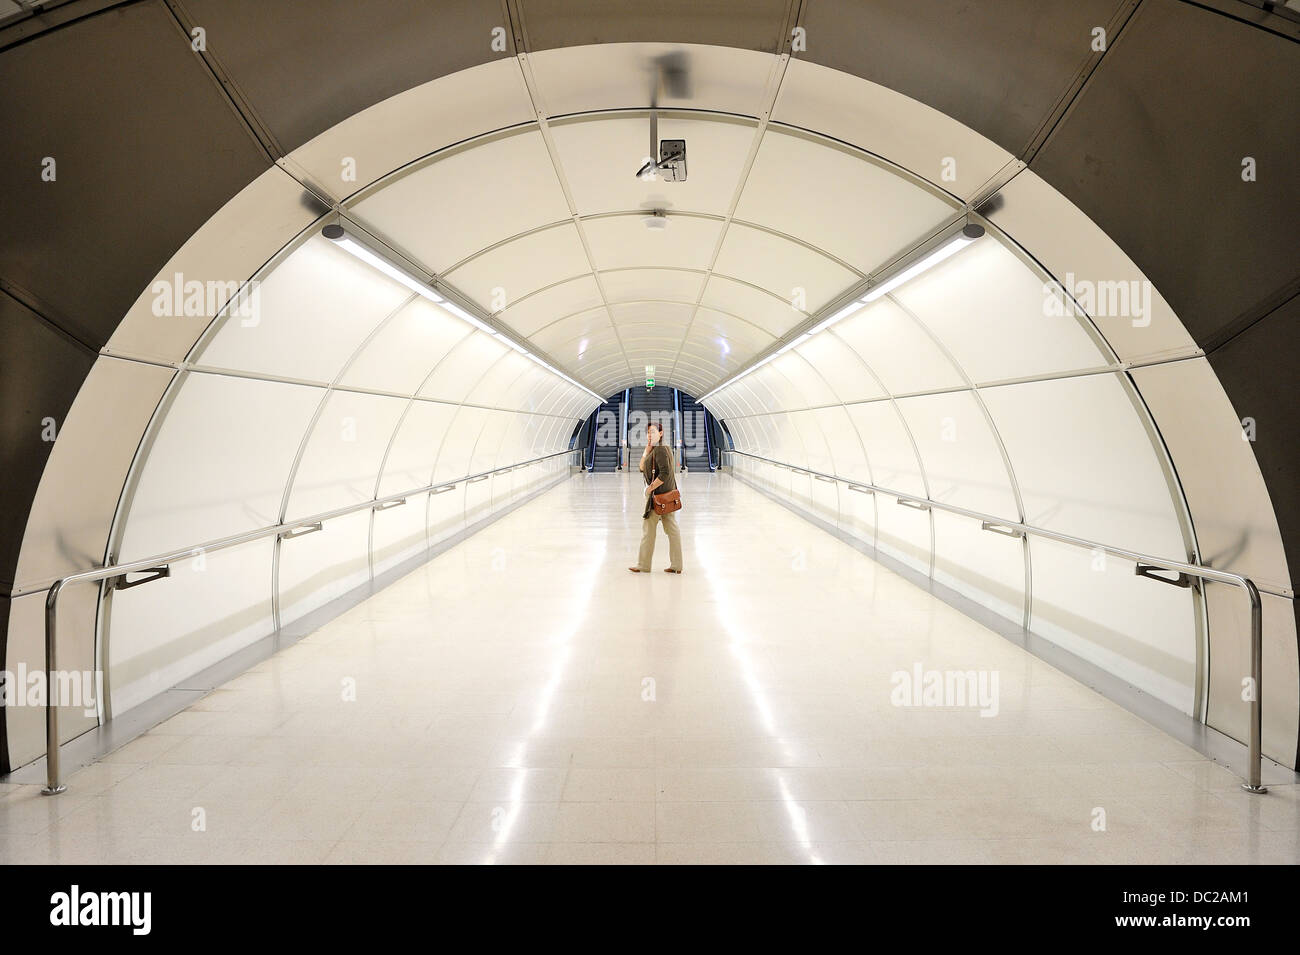 Intxaurrondo subway station, Donostia, Guipuzkoa, Basque Country, Spain, Europe, - Stock Image